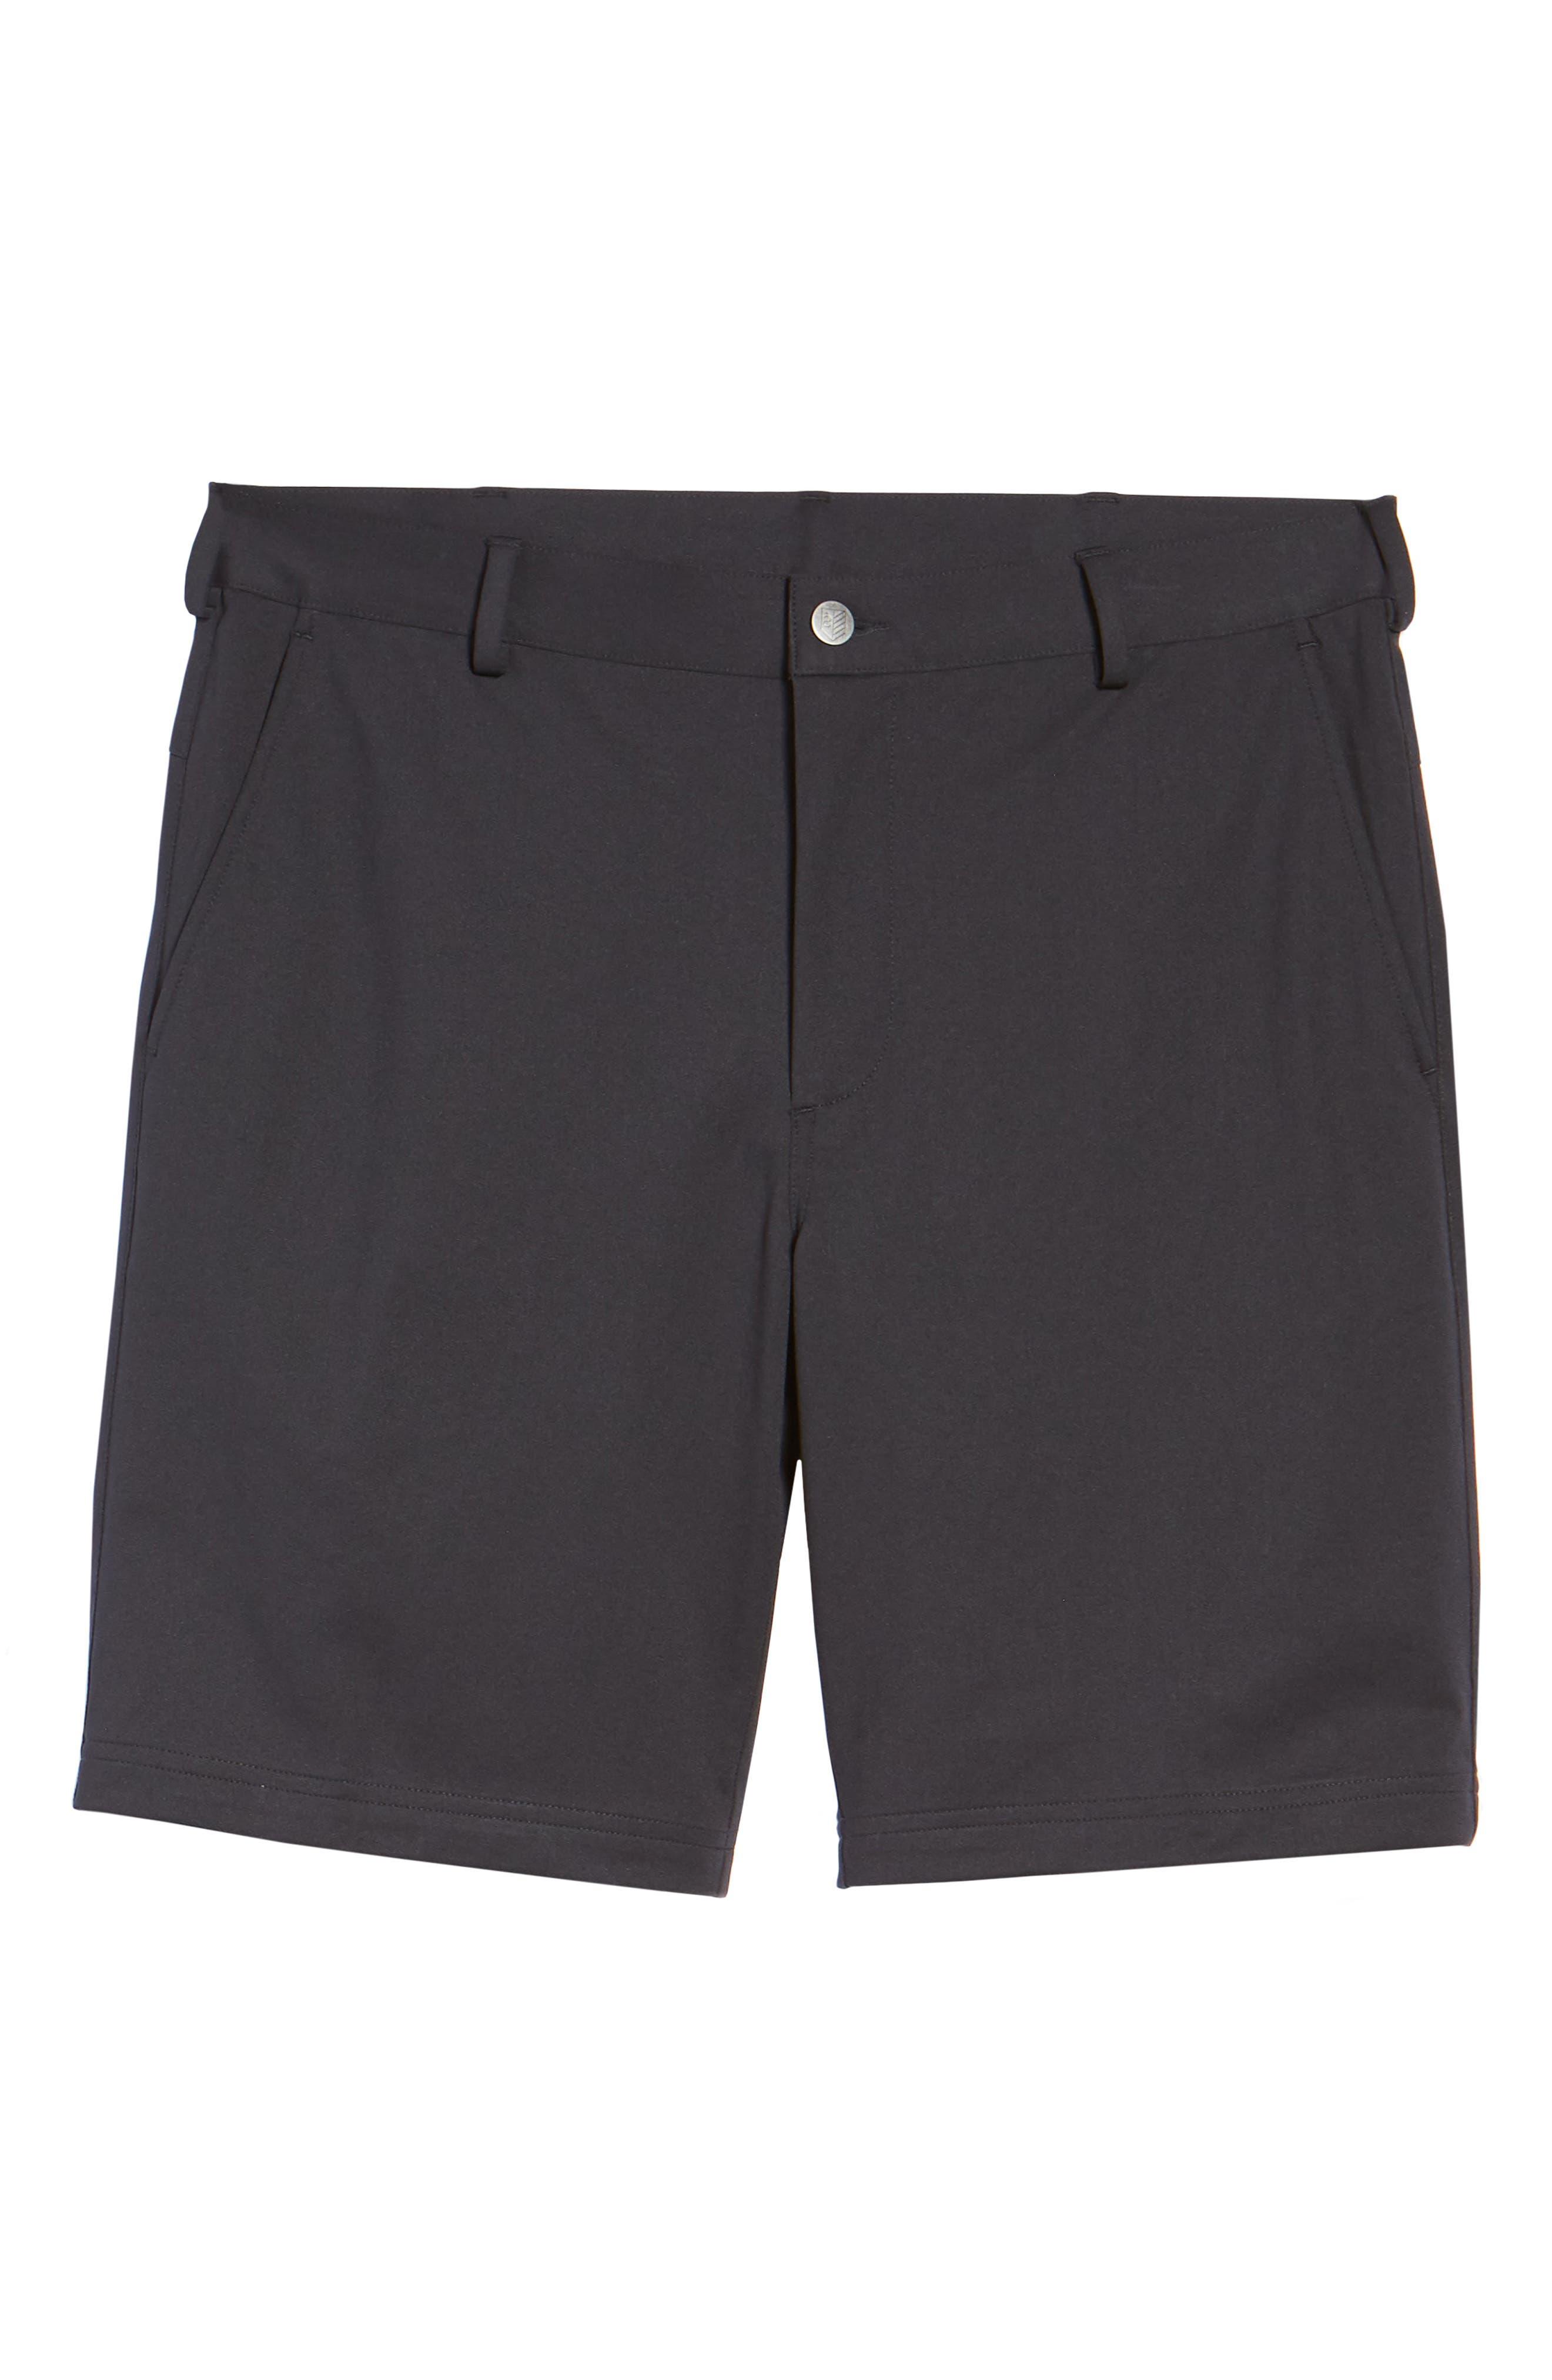 BOBBY JONES,                             Trim Fit Tech Chino Shorts,                             Alternate thumbnail 6, color,                             001